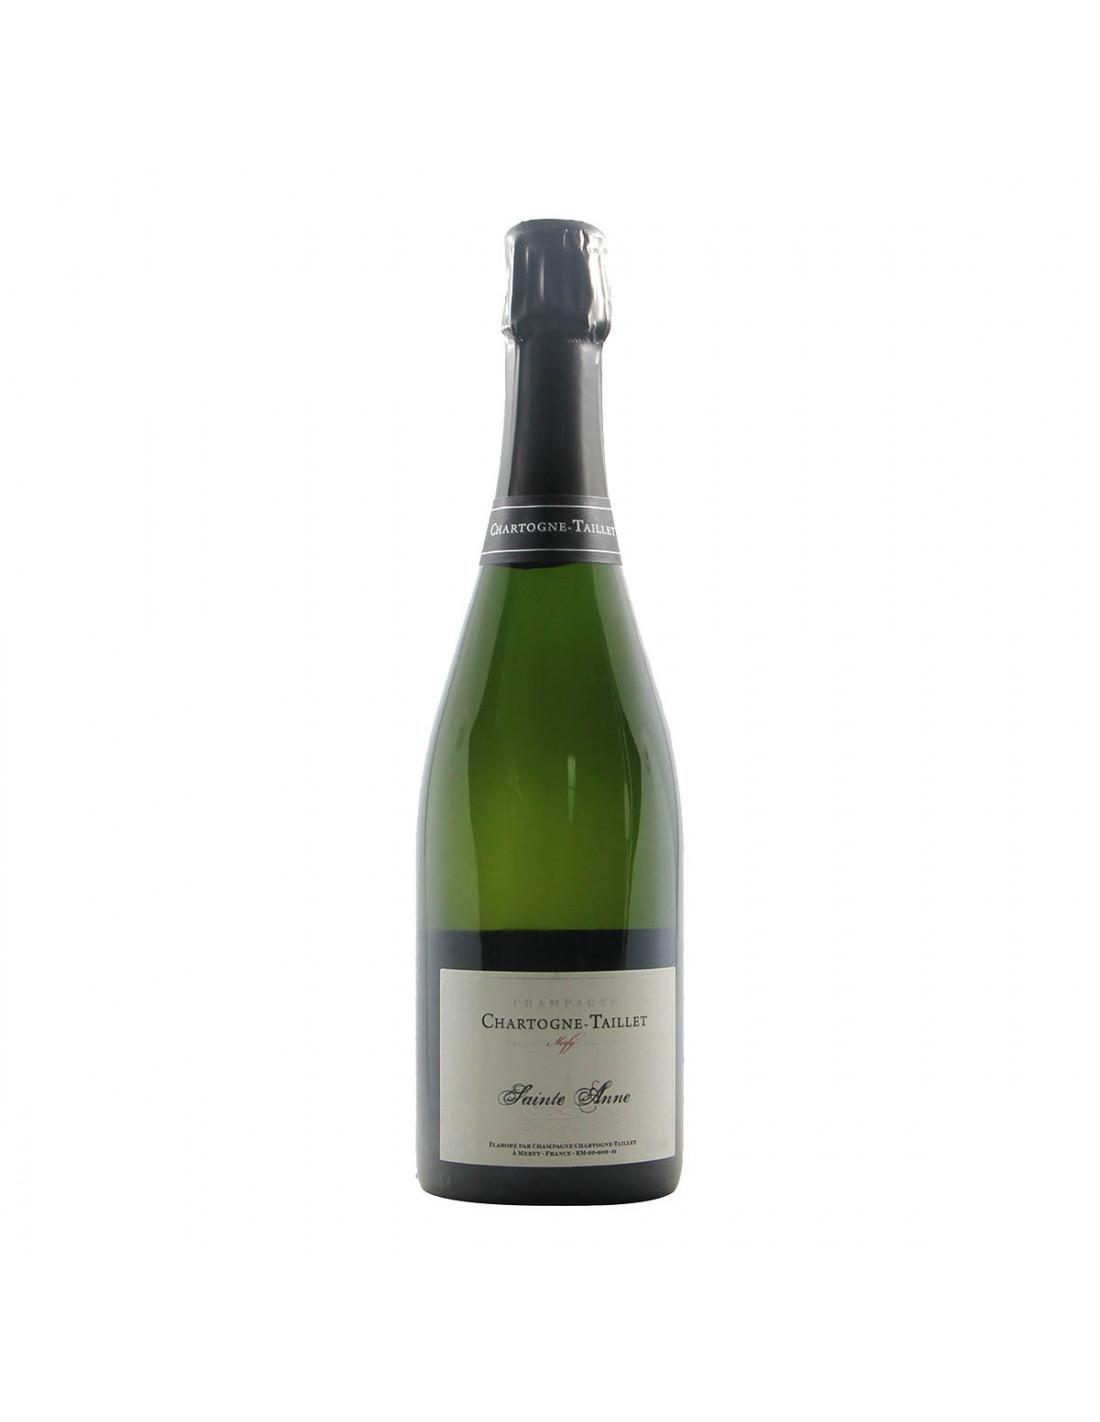 Chartogne Taillet Champagne Sainte Anne Grandi Bottiglie